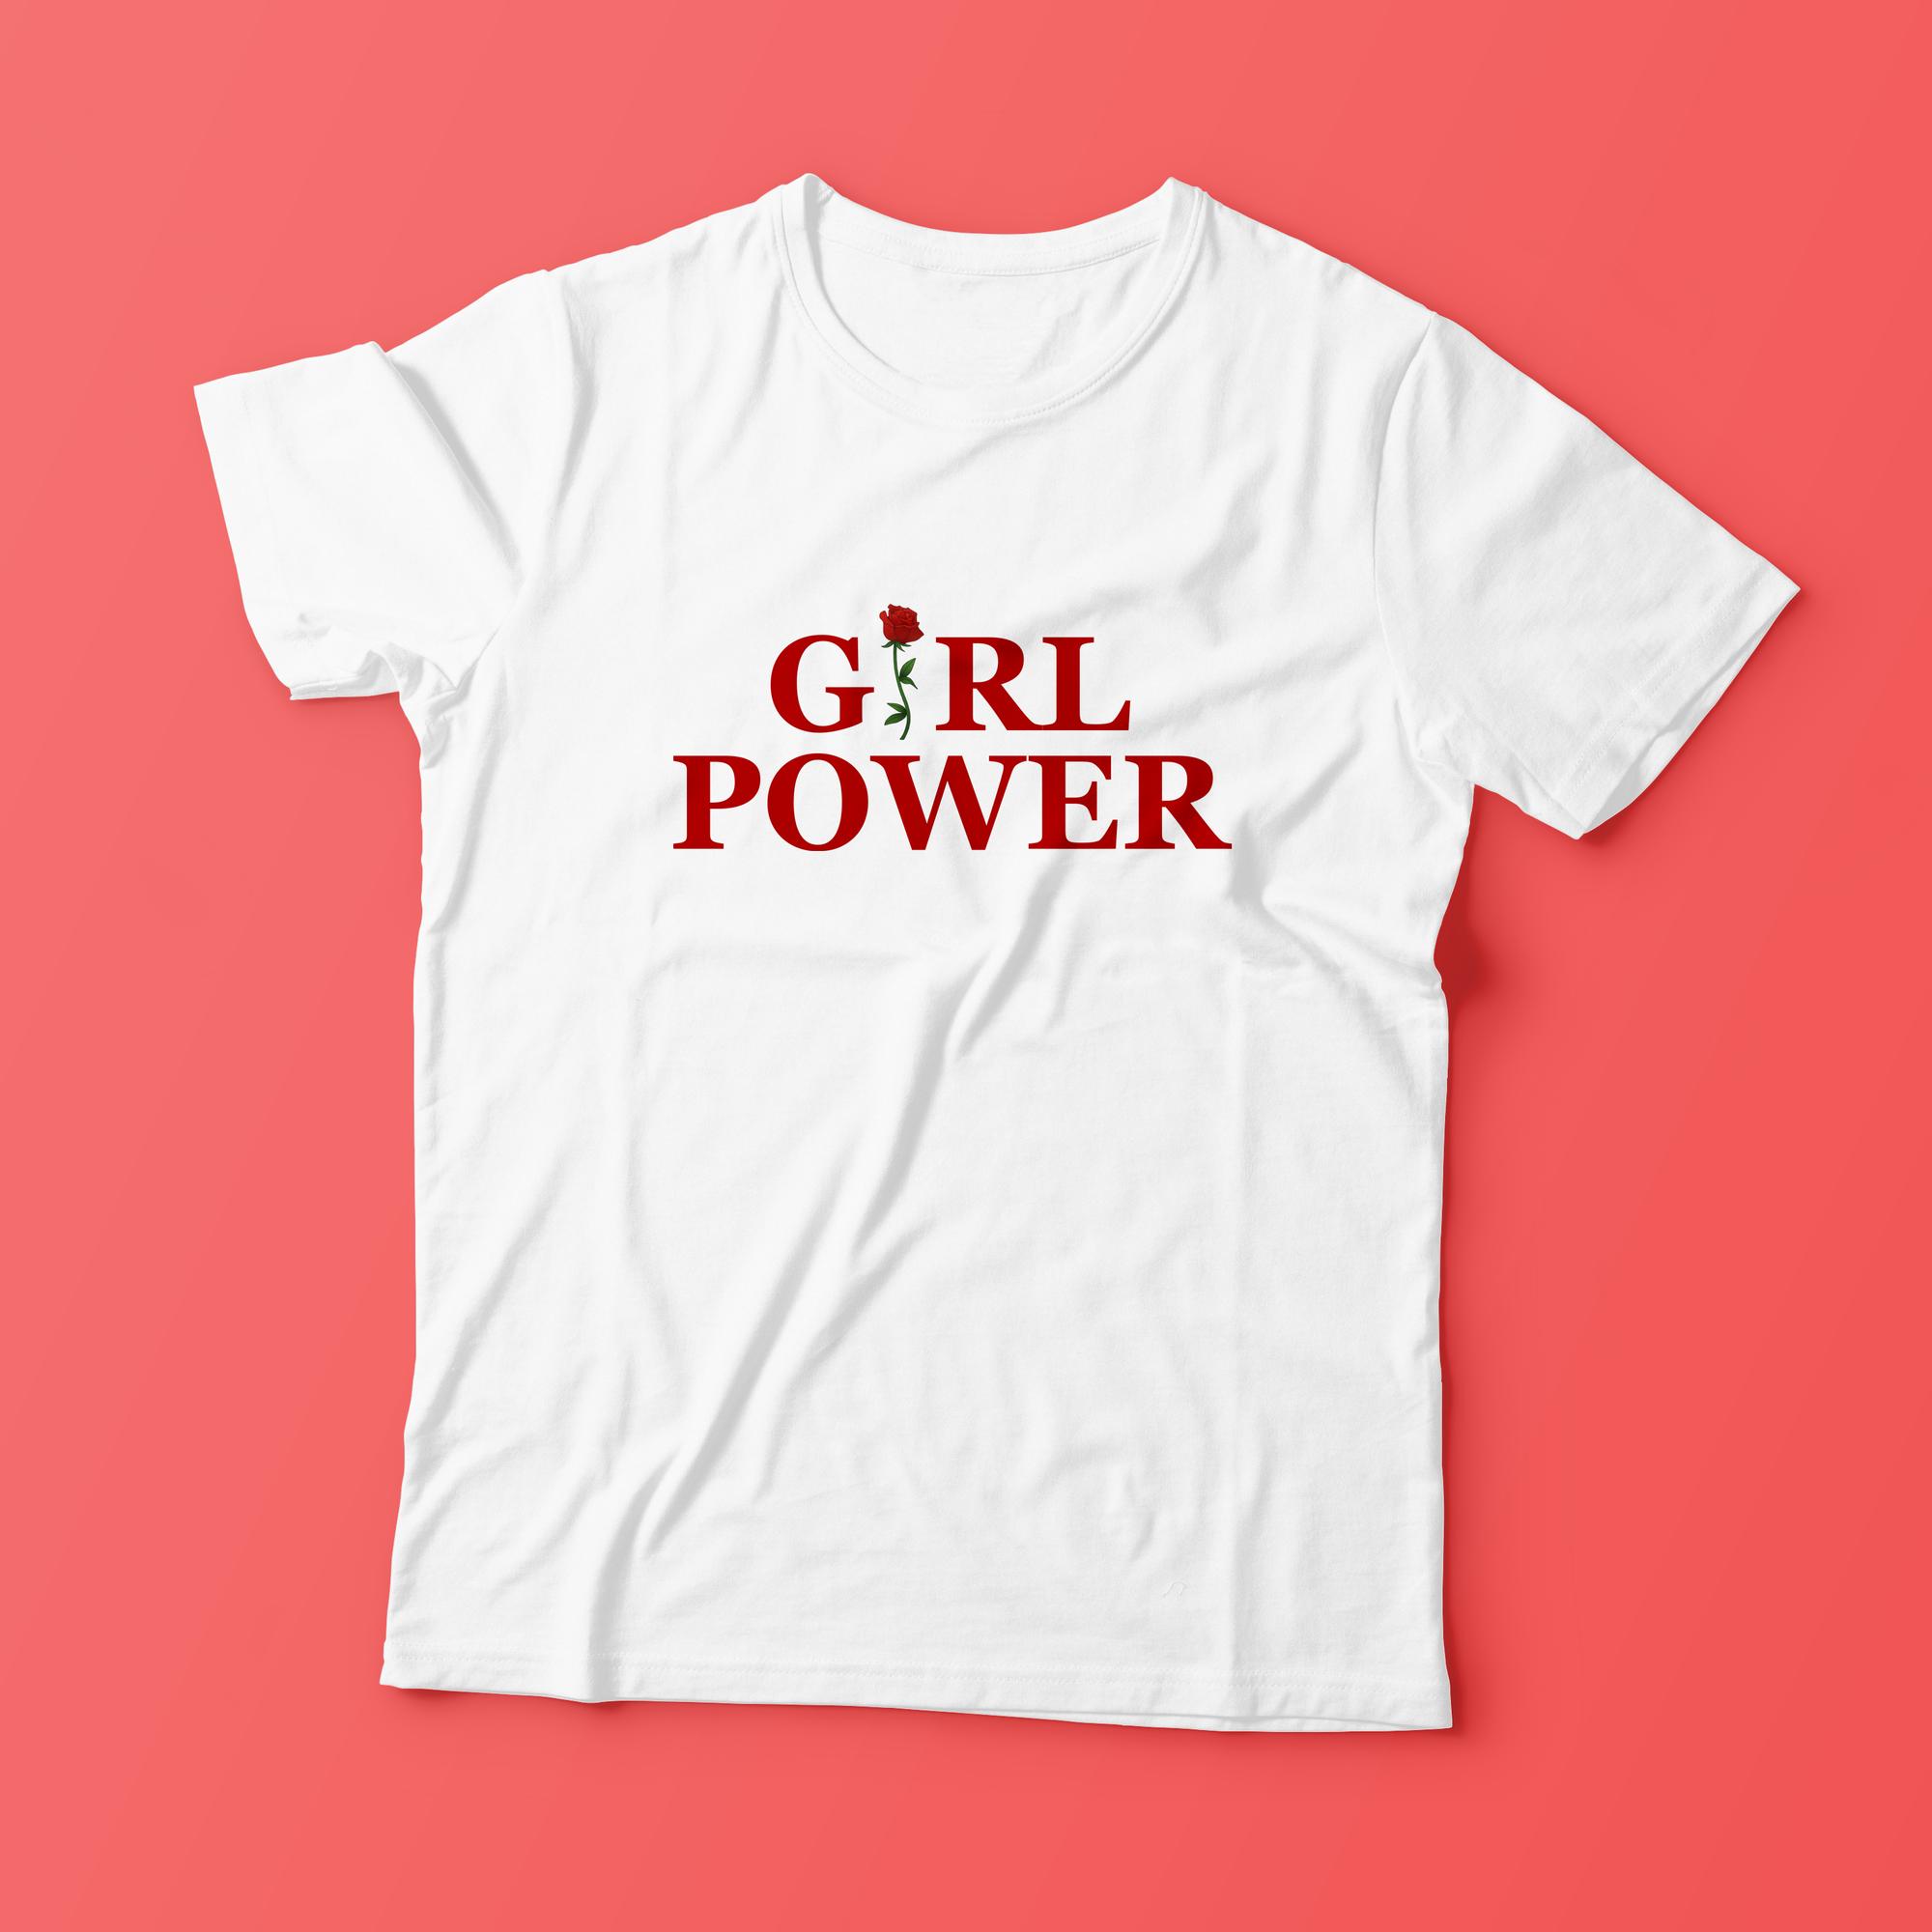 Girl power photo